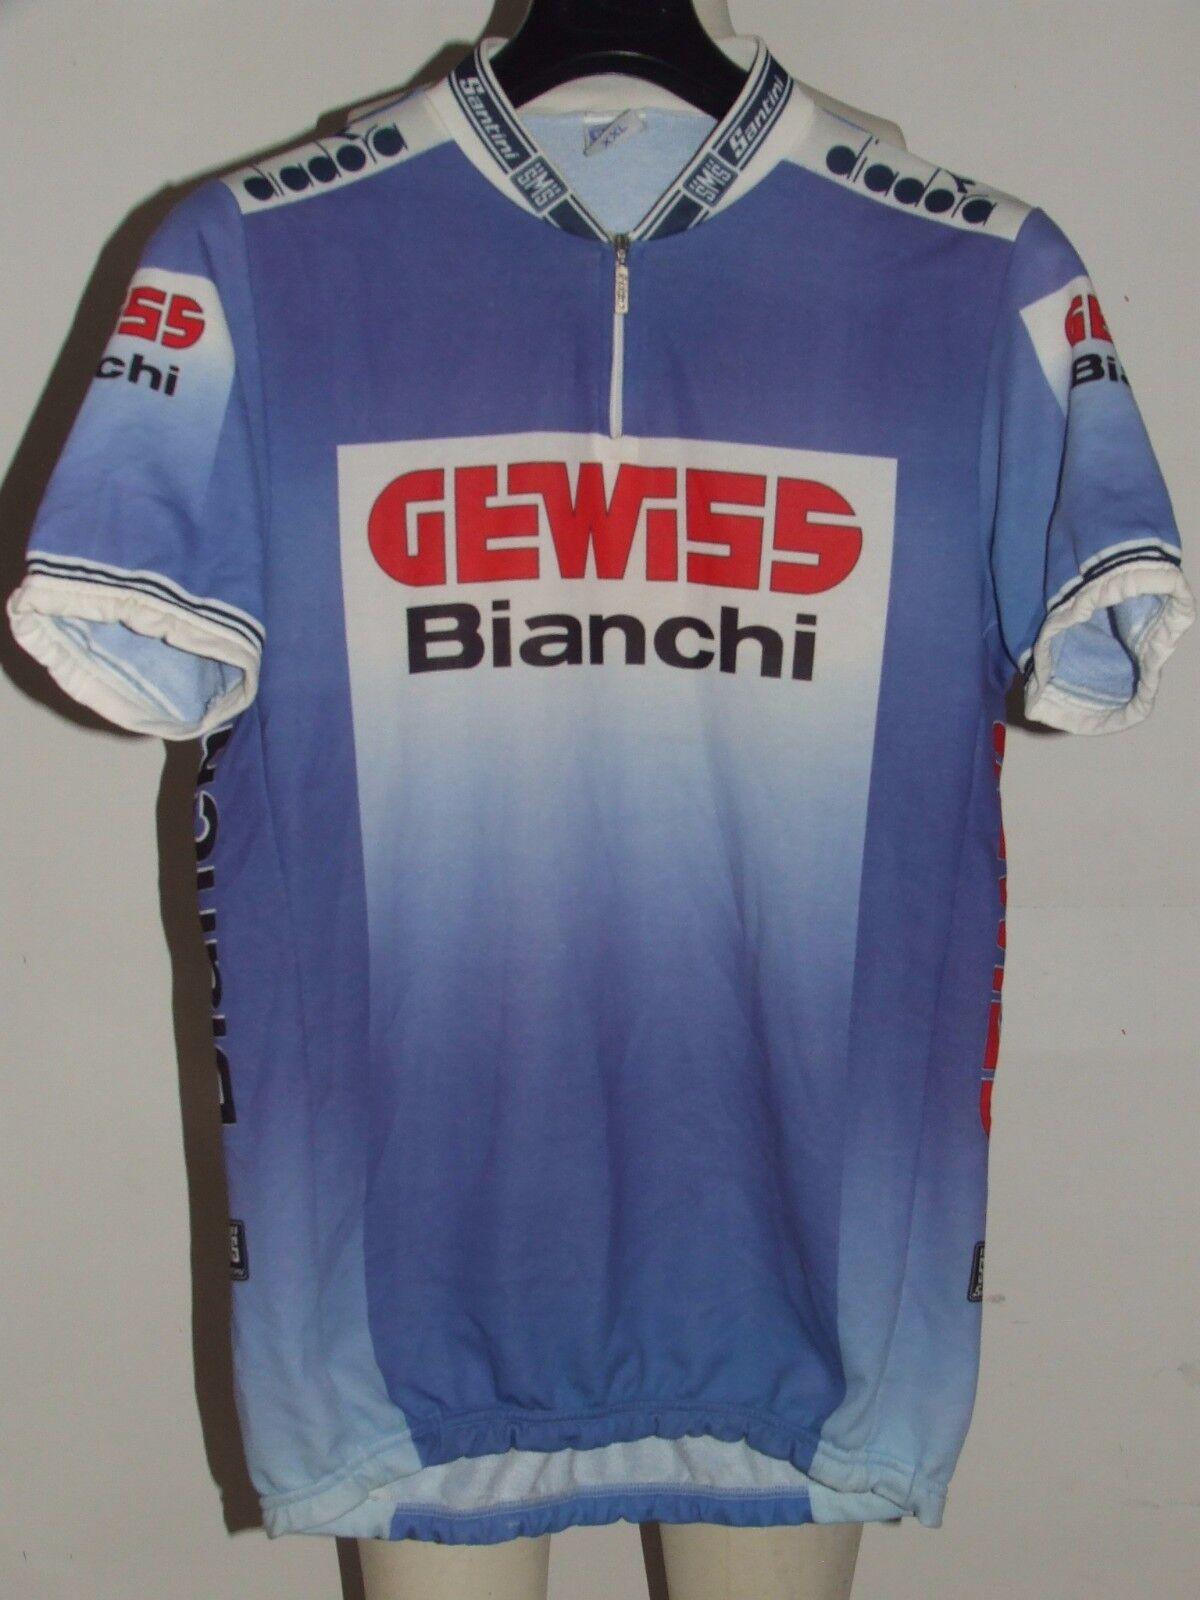 Bike Cycling Jersey Shirt Maillot Cyclism Team Gewiss Bian   Santini Size XXL  free shipping!